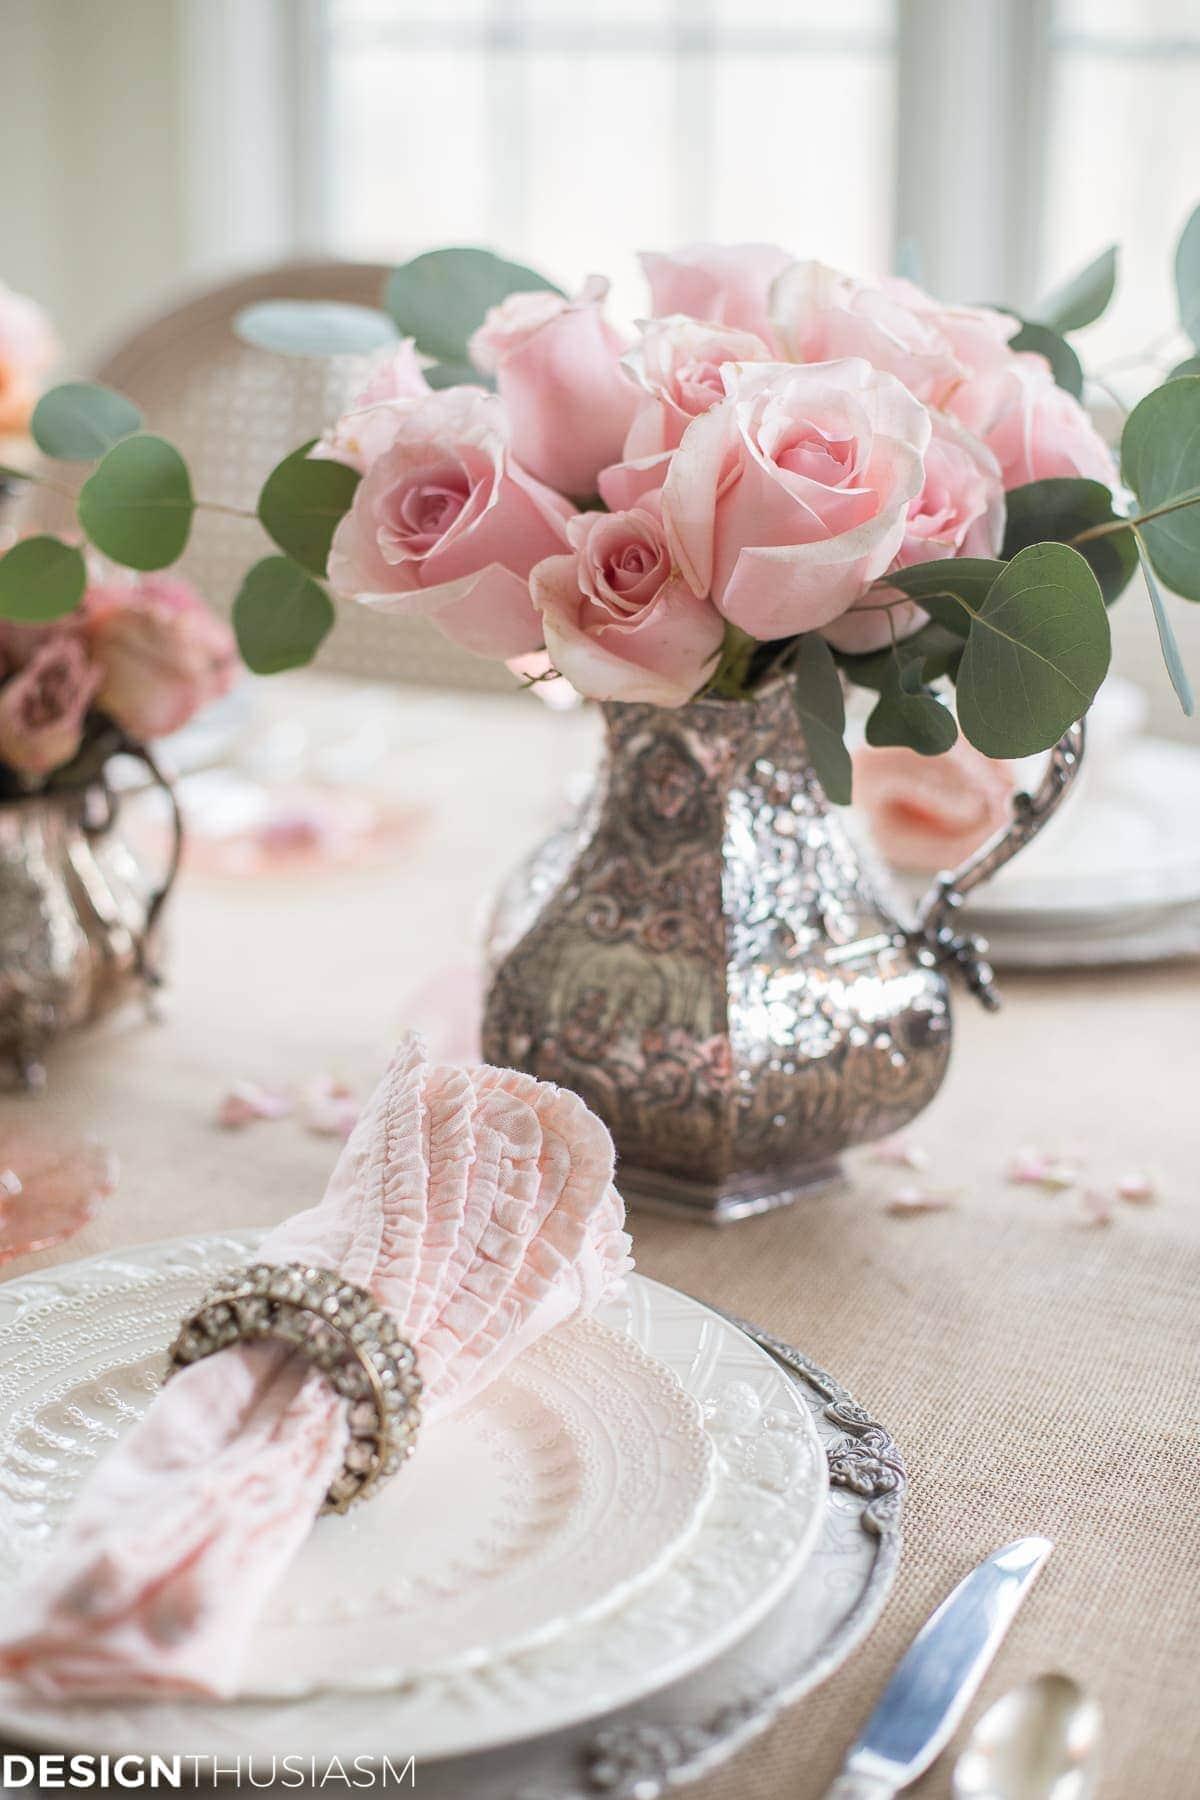 Rustic Romance: A Valentine's Day Table Setting - designthusiasm.com